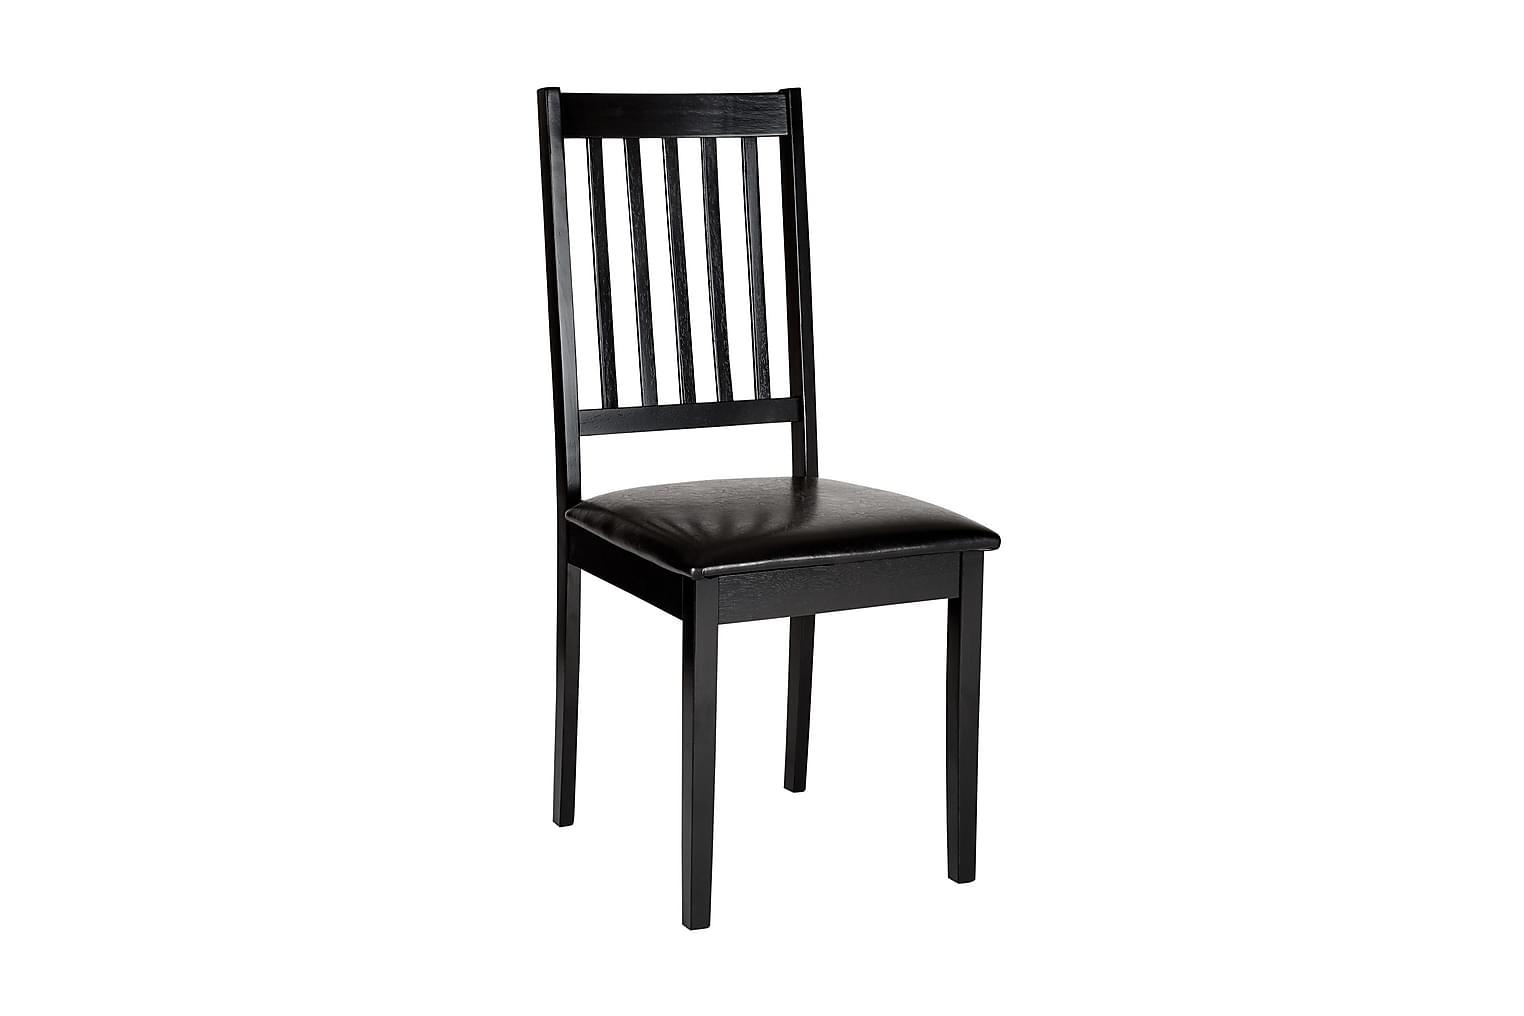 SETAR Tuoli Musta